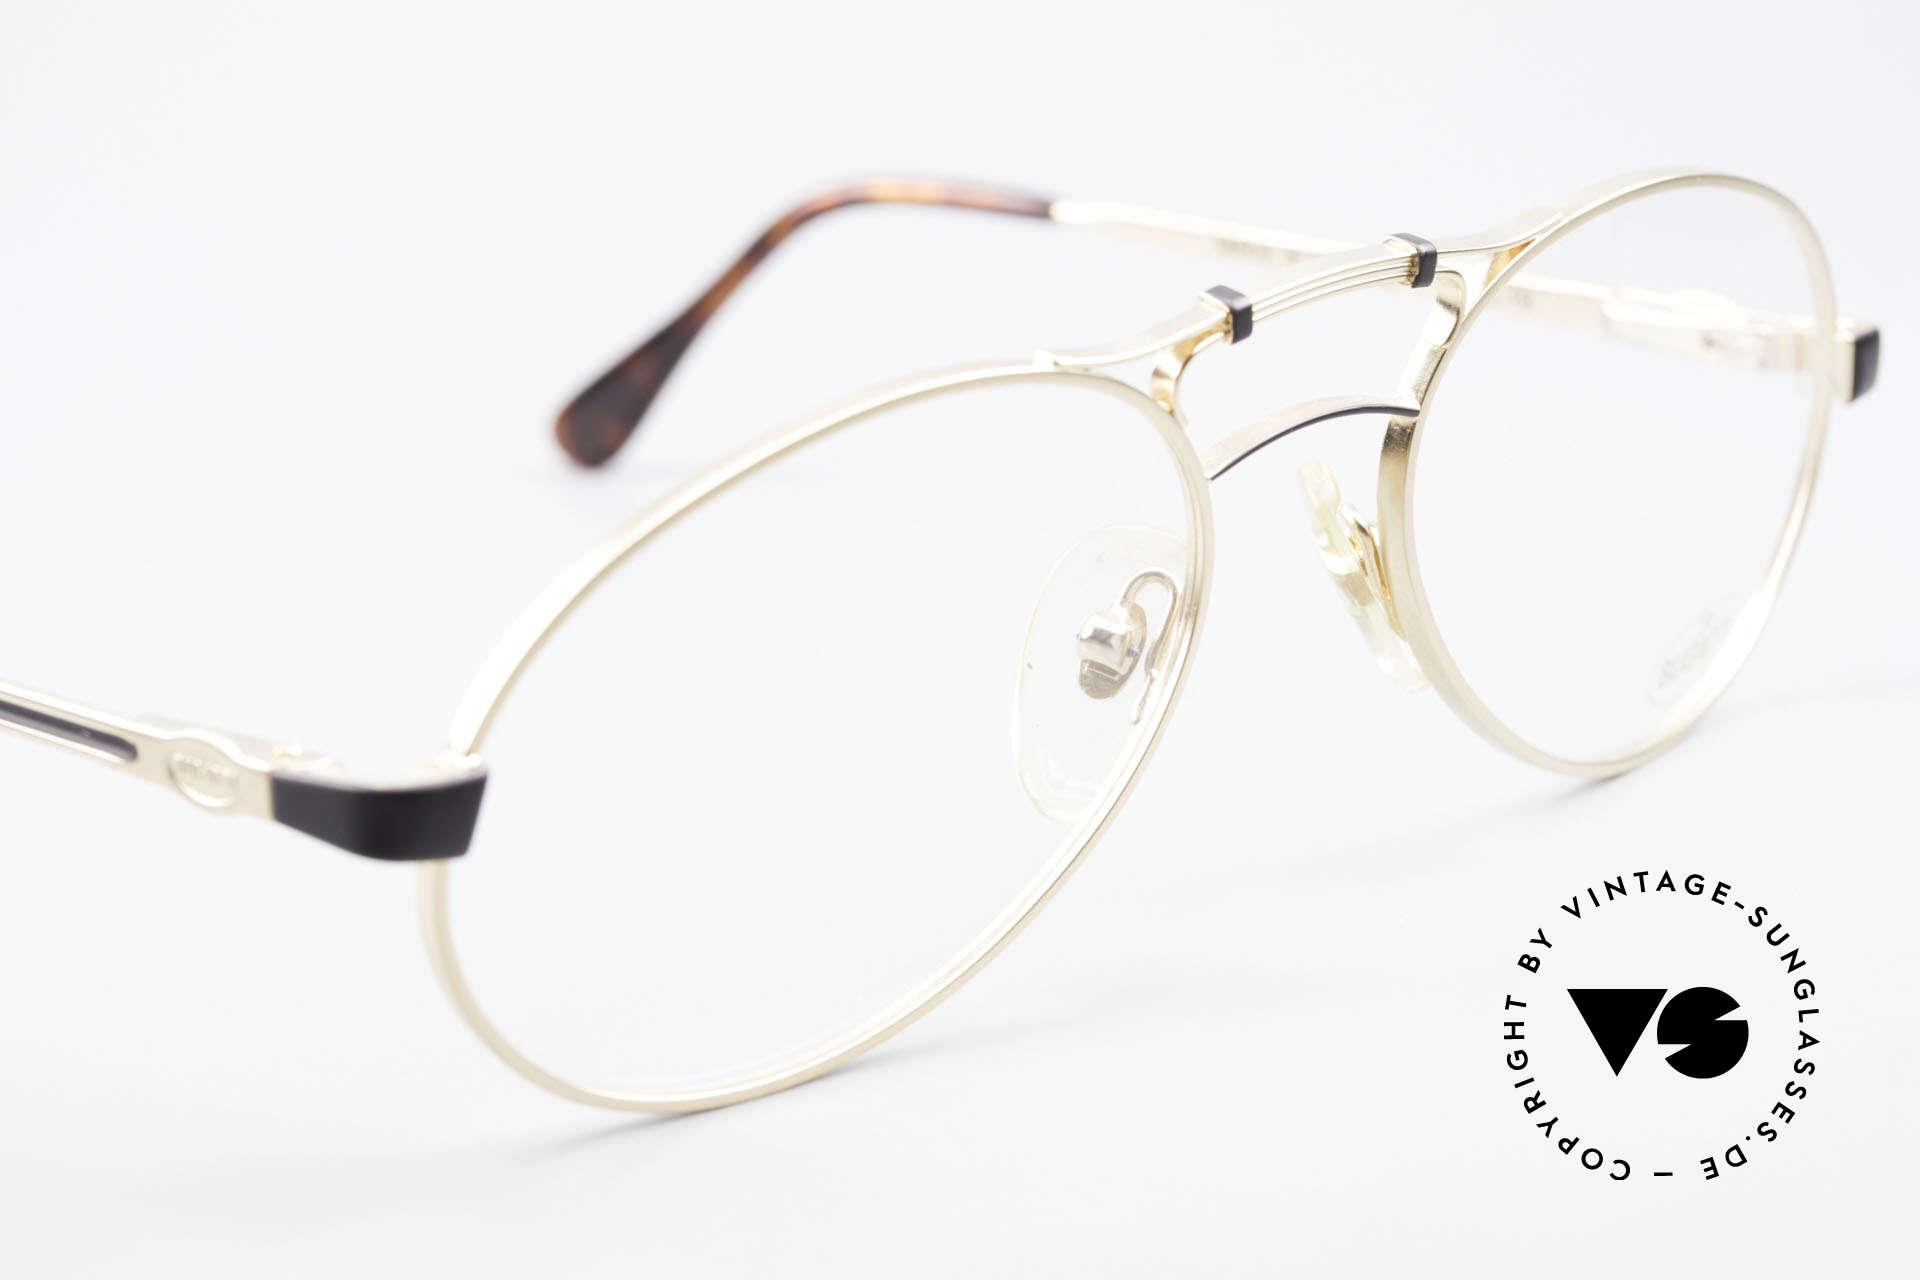 Bugatti 13411 Vintage Men's Eyeglass Frame, still unworn (like all our vintage 90's Bugatti glasses), Made for Men